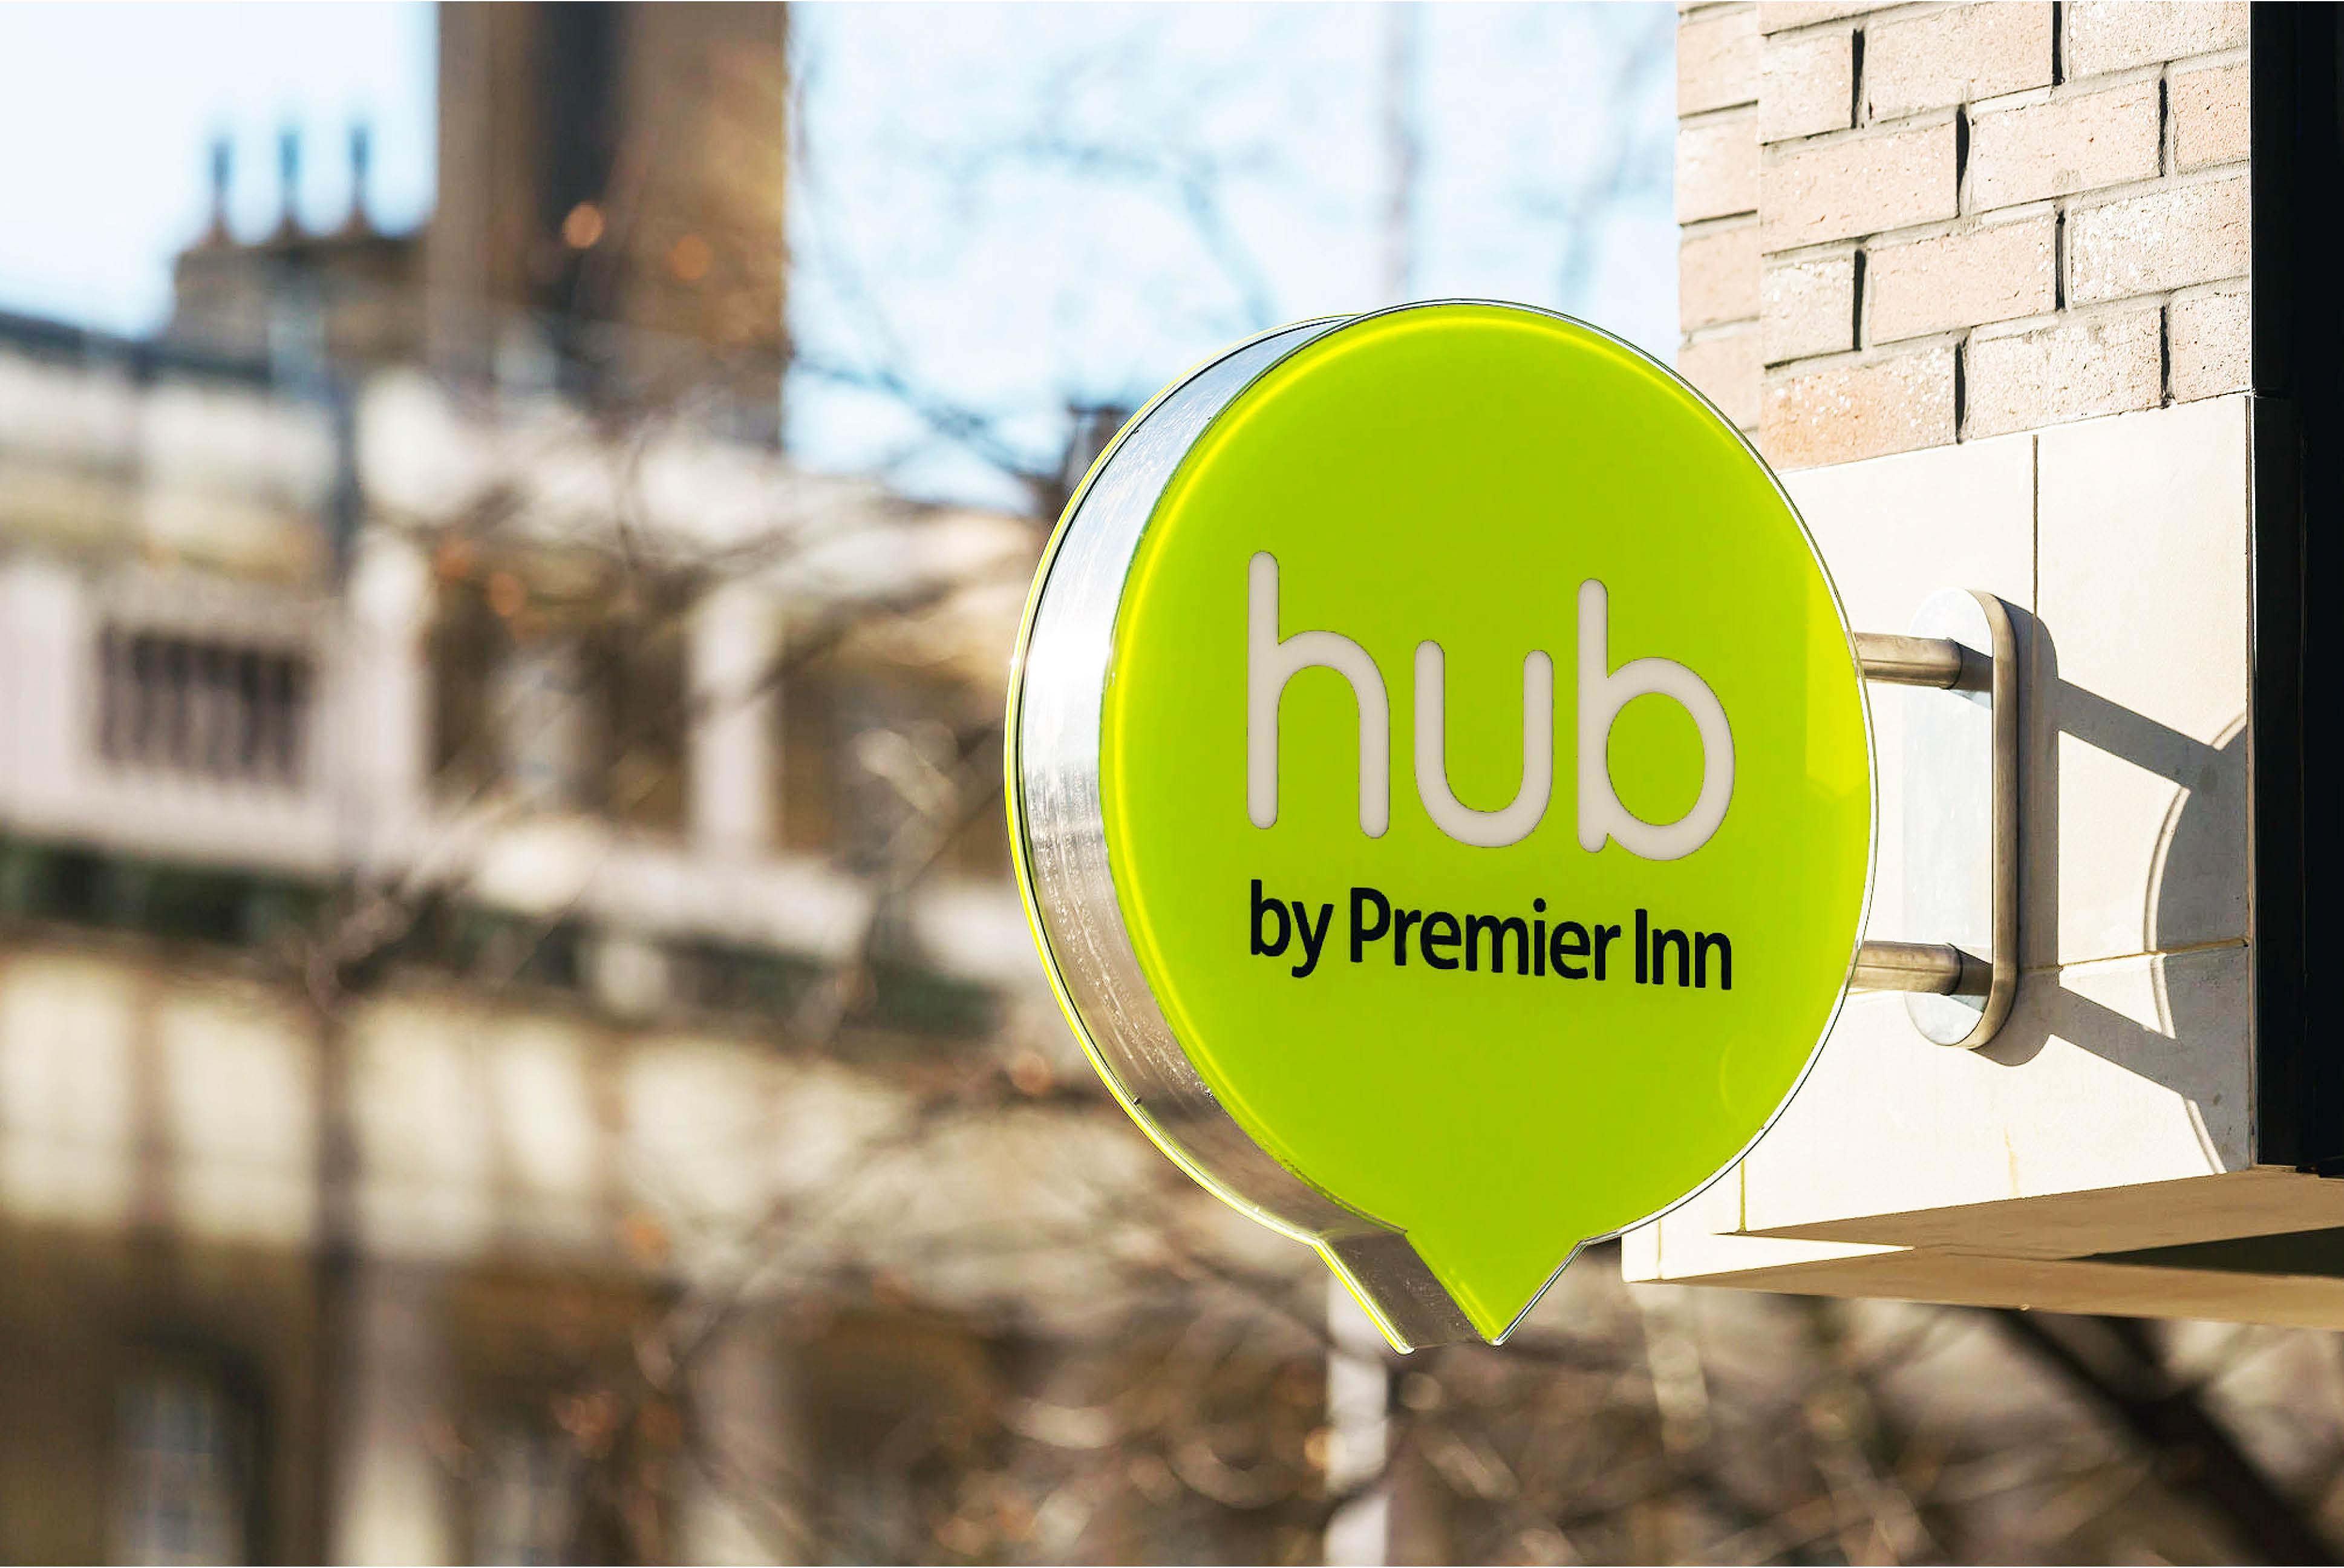 Hub by Premier Inn Signage   Independent Marketing Branding   IM London